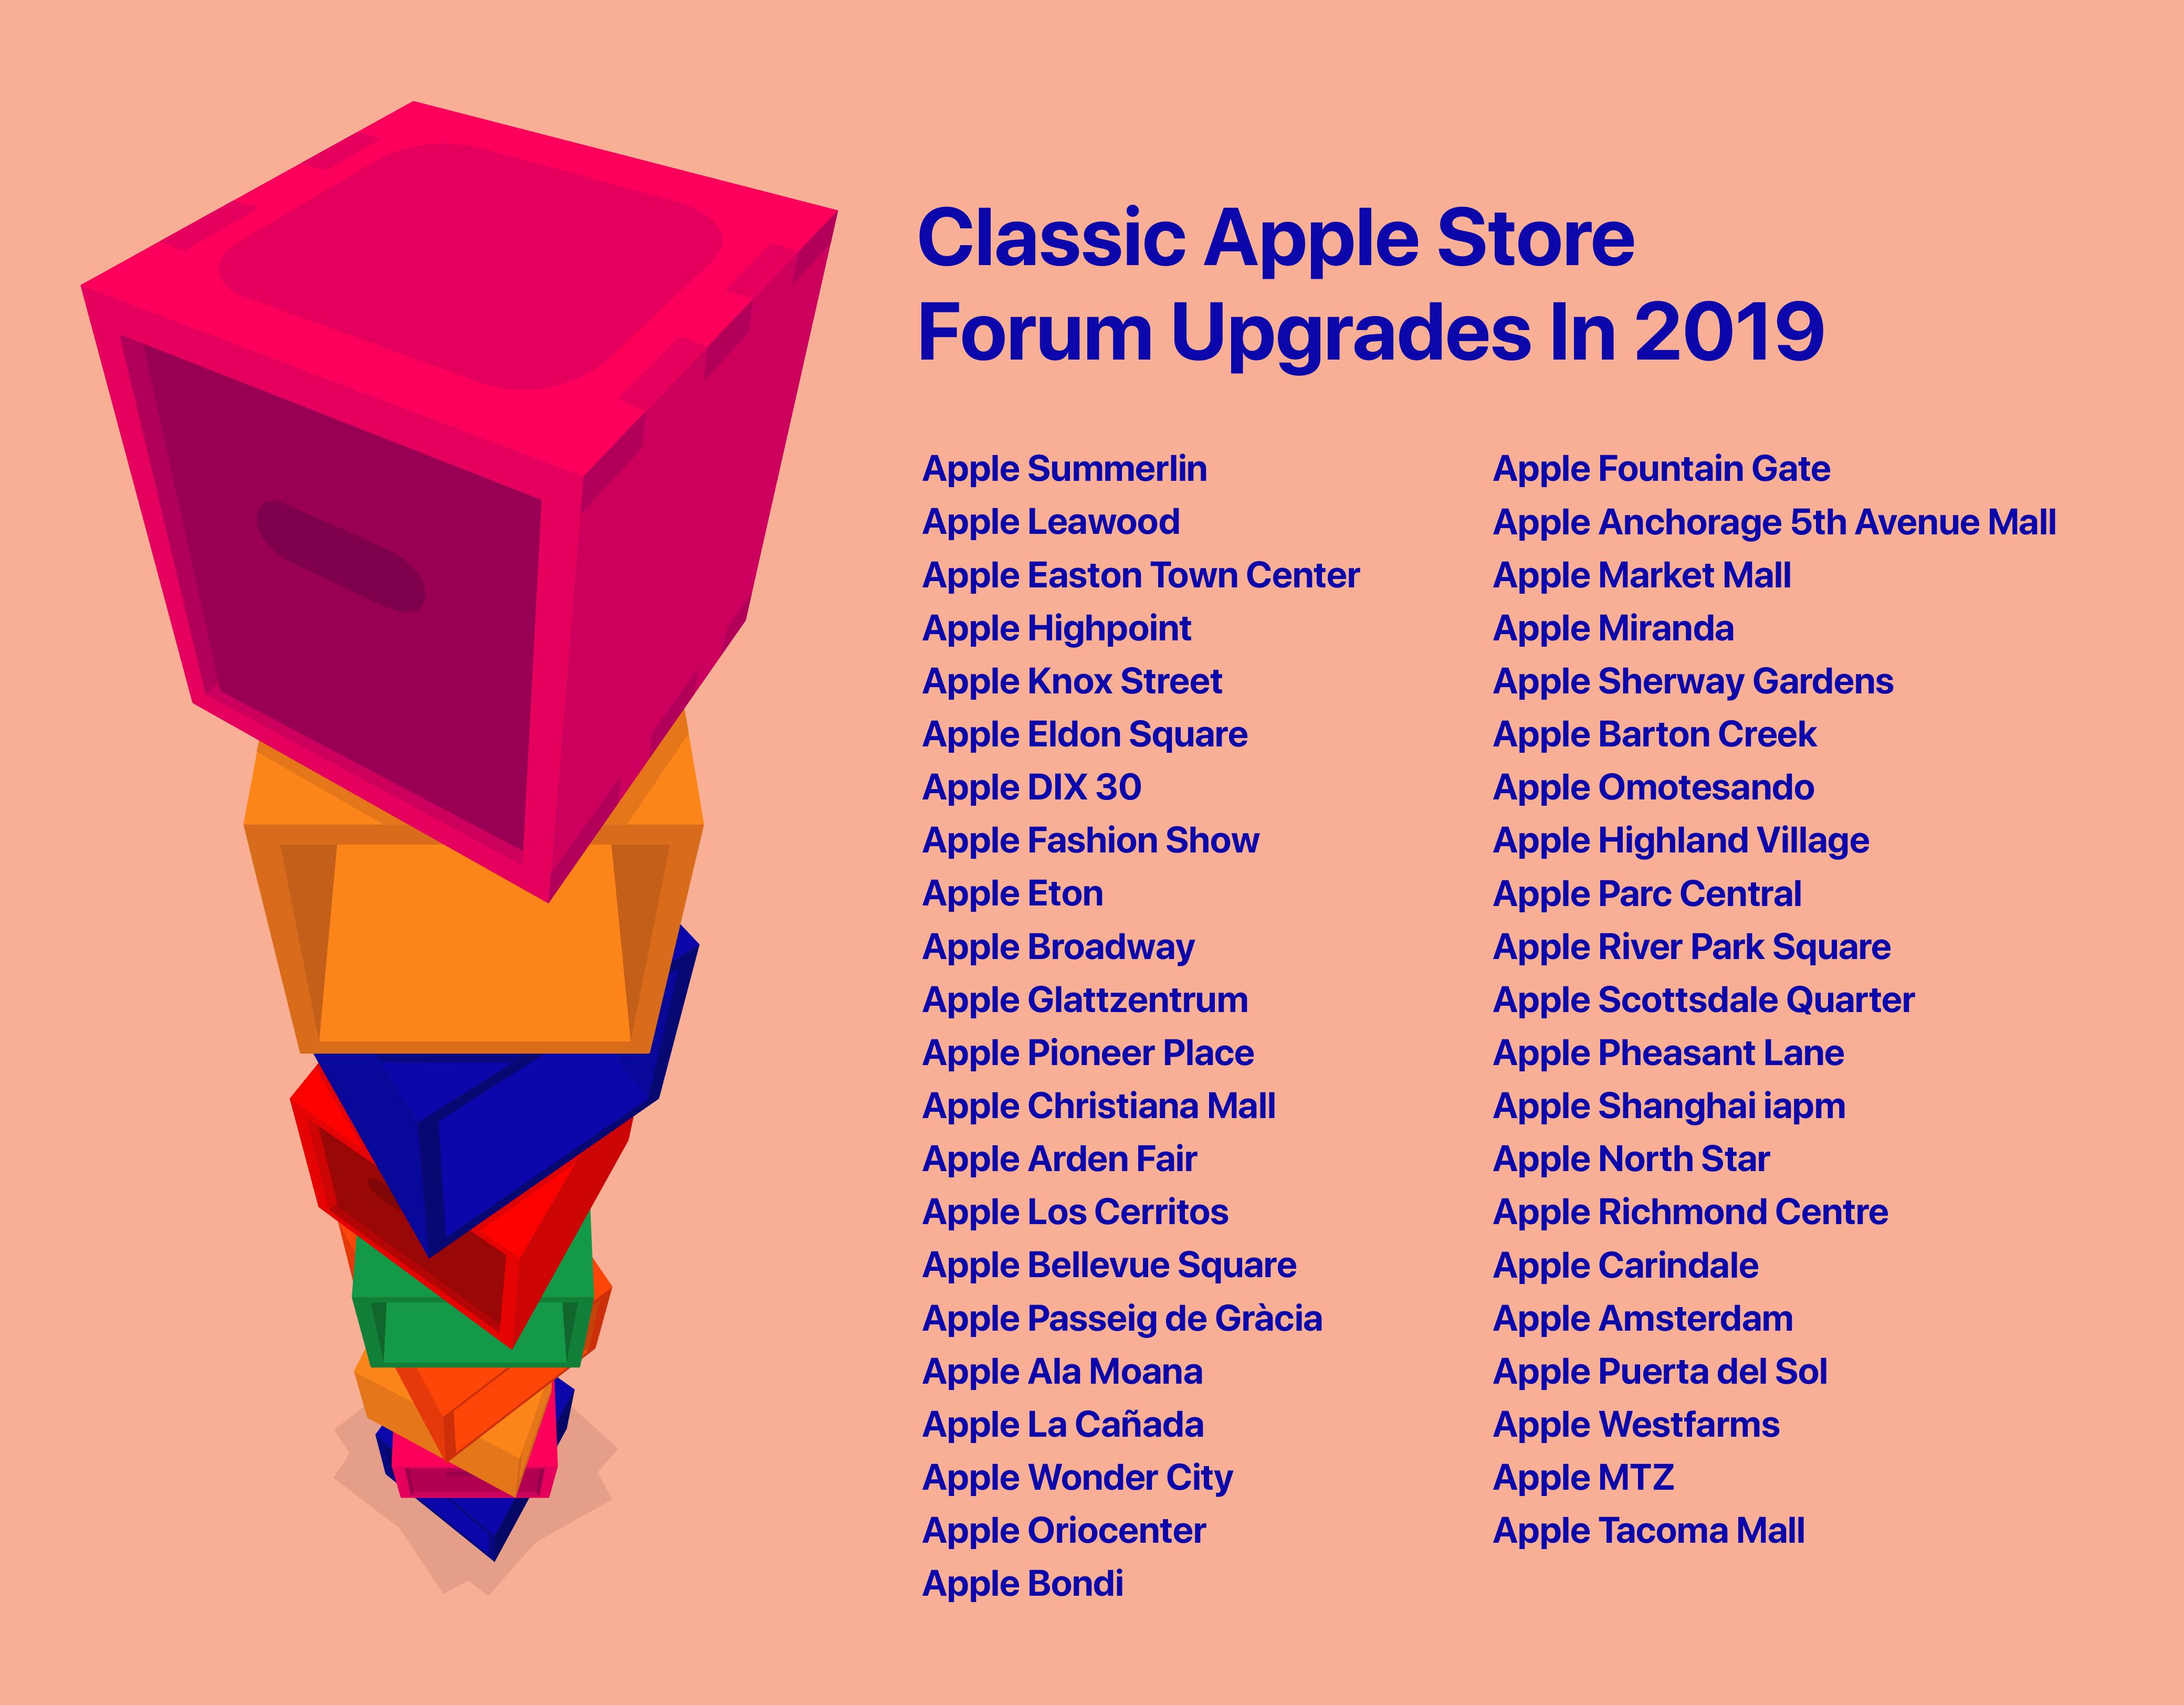 Classic Apple Store Forum Upgrades In 2019